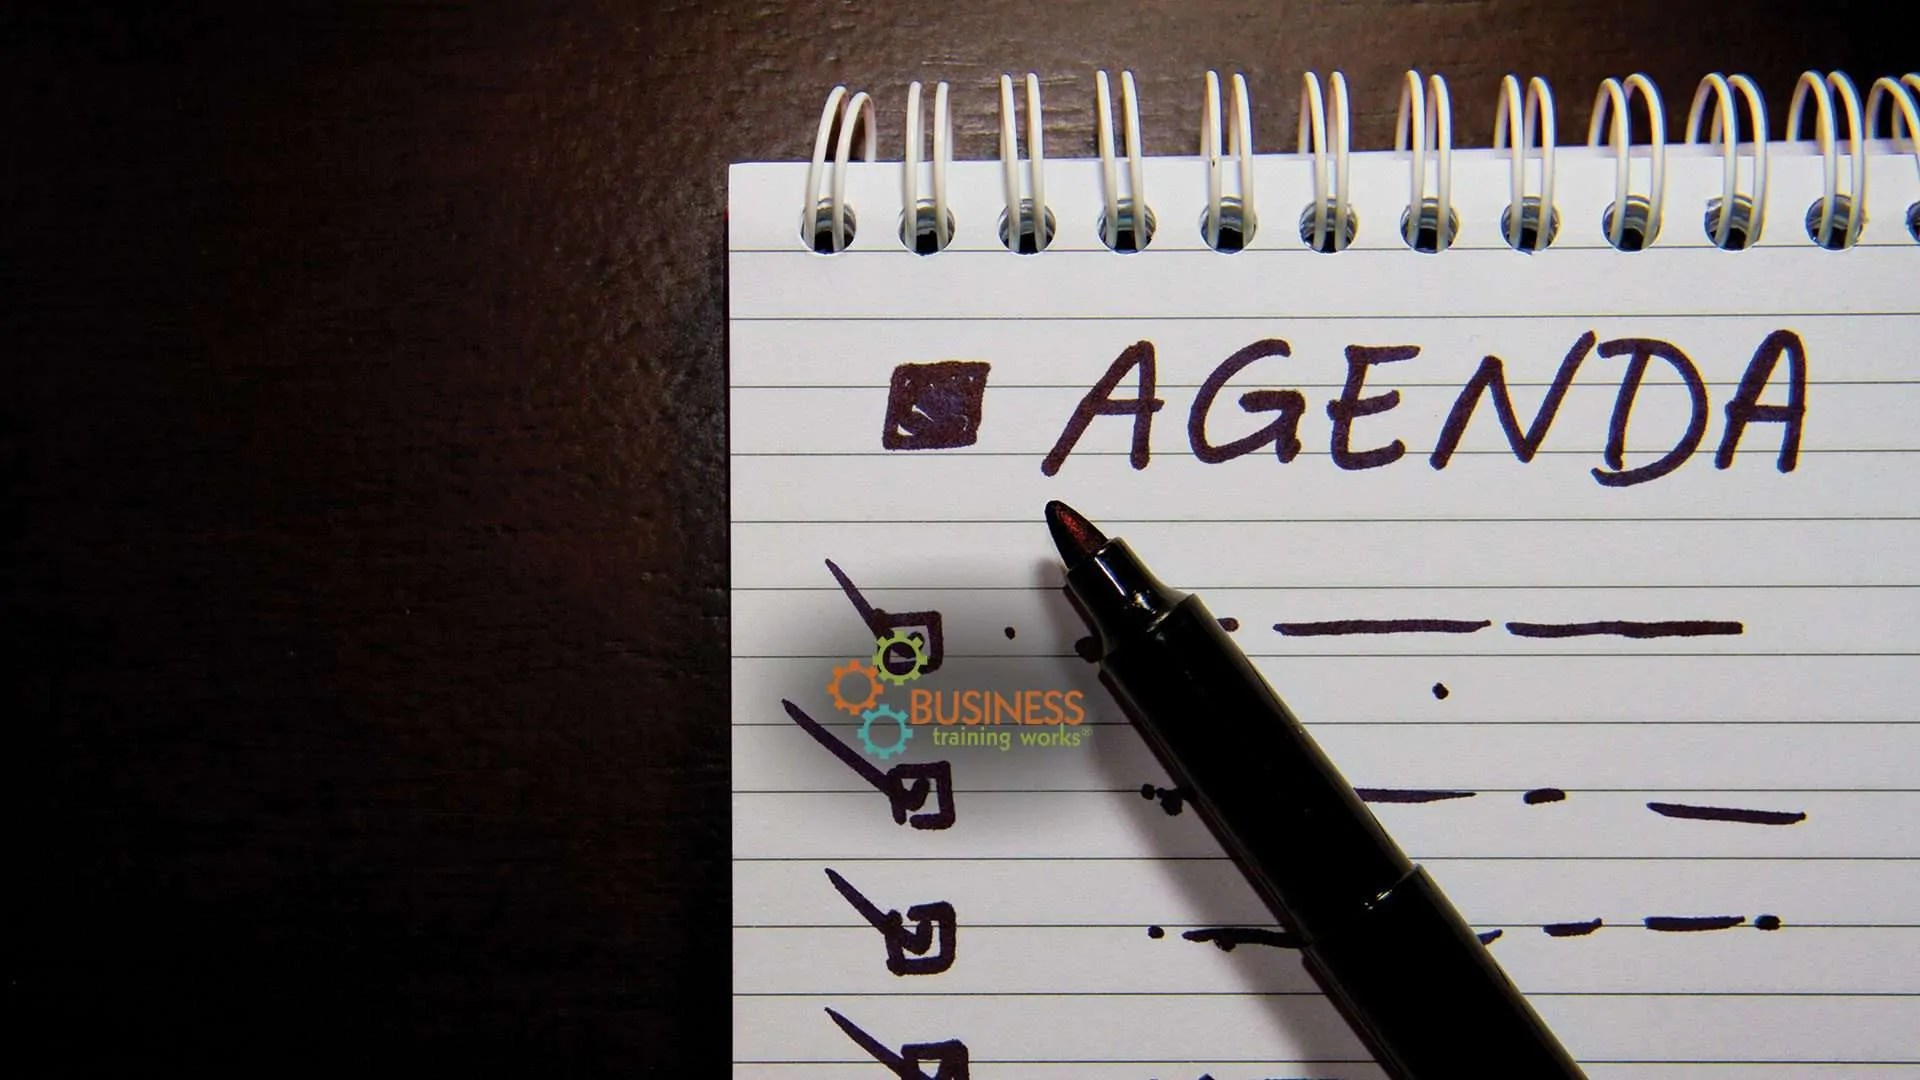 Meeting Management Training